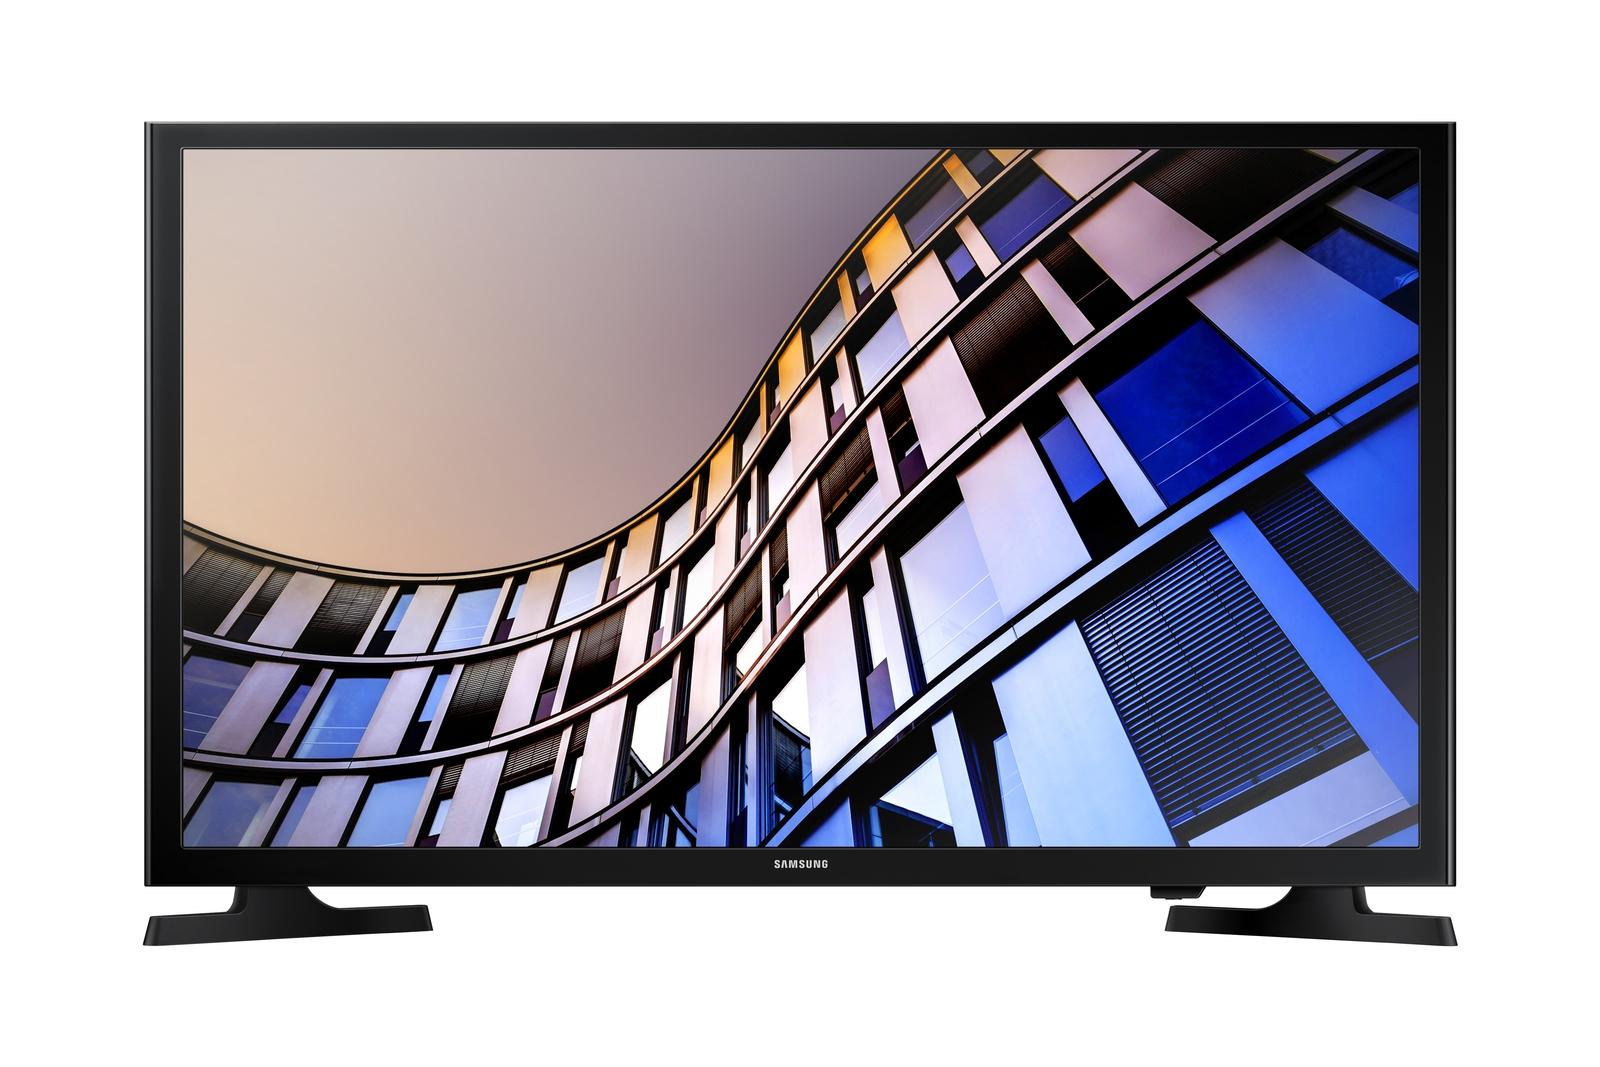 """Samsung 32"""" Class M4500 HD TV, Glossy Black"""